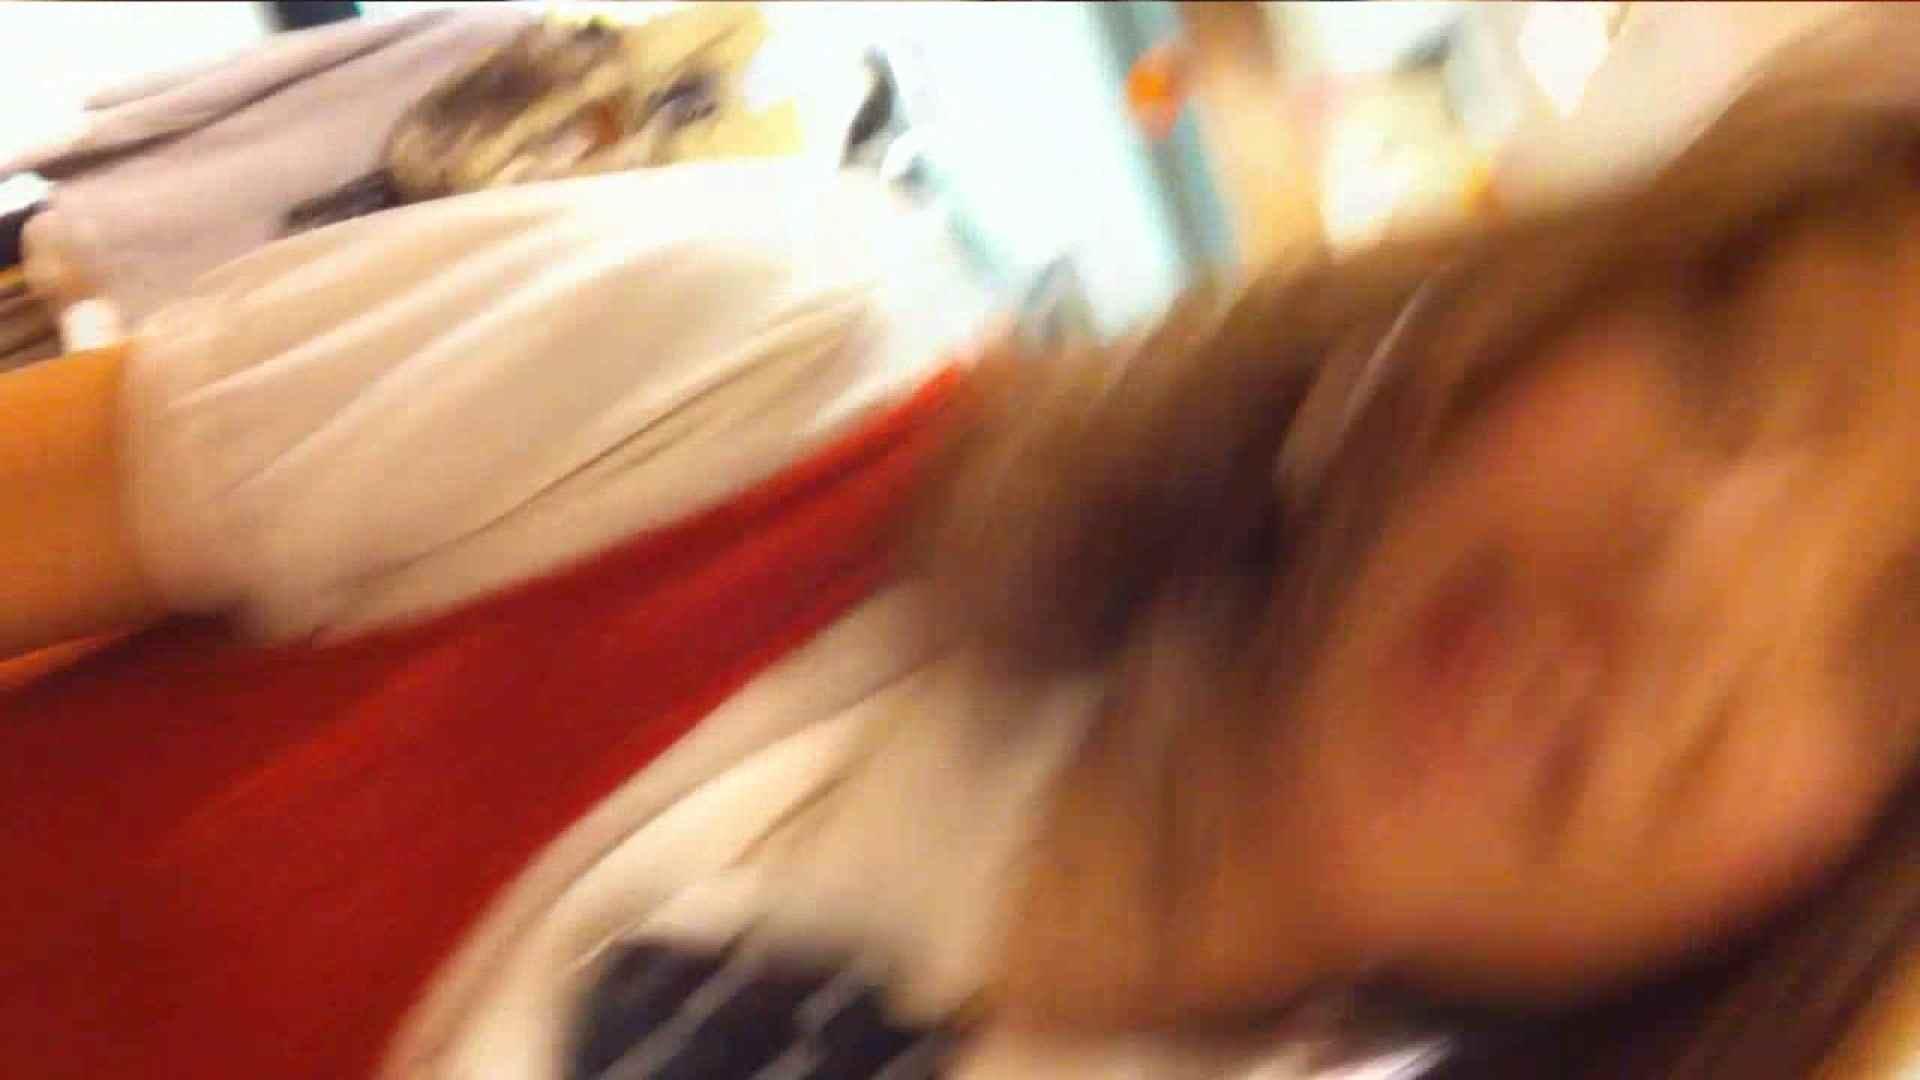 vol.33 美人アパレル胸チラ&パンチラ ギャル系ネーチャンの下着 新入生パンチラ すけべAV動画紹介 92pic 73